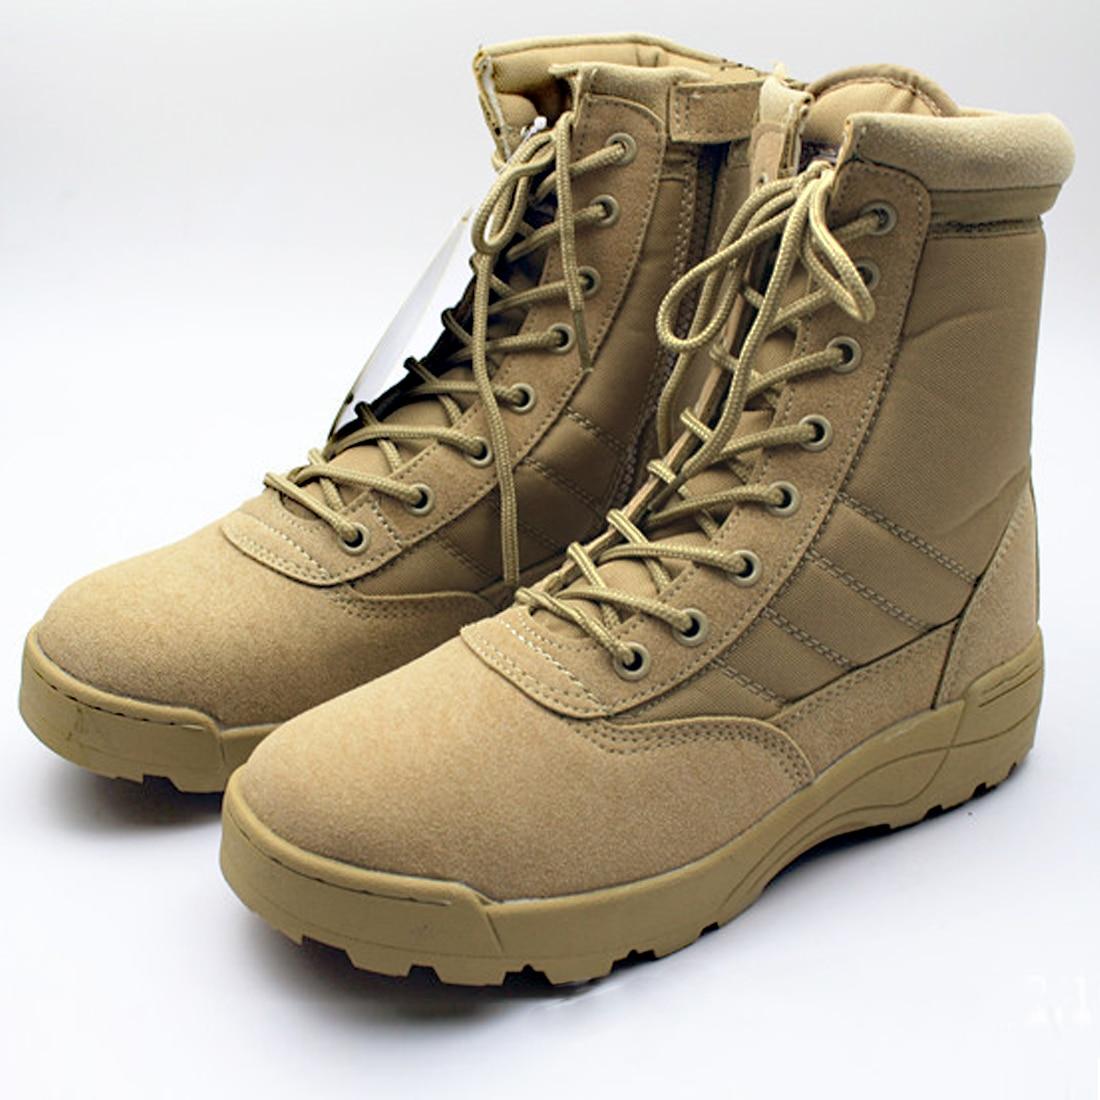 Online Get Cheap Mens Fall Boots -Aliexpress.com | Alibaba Group